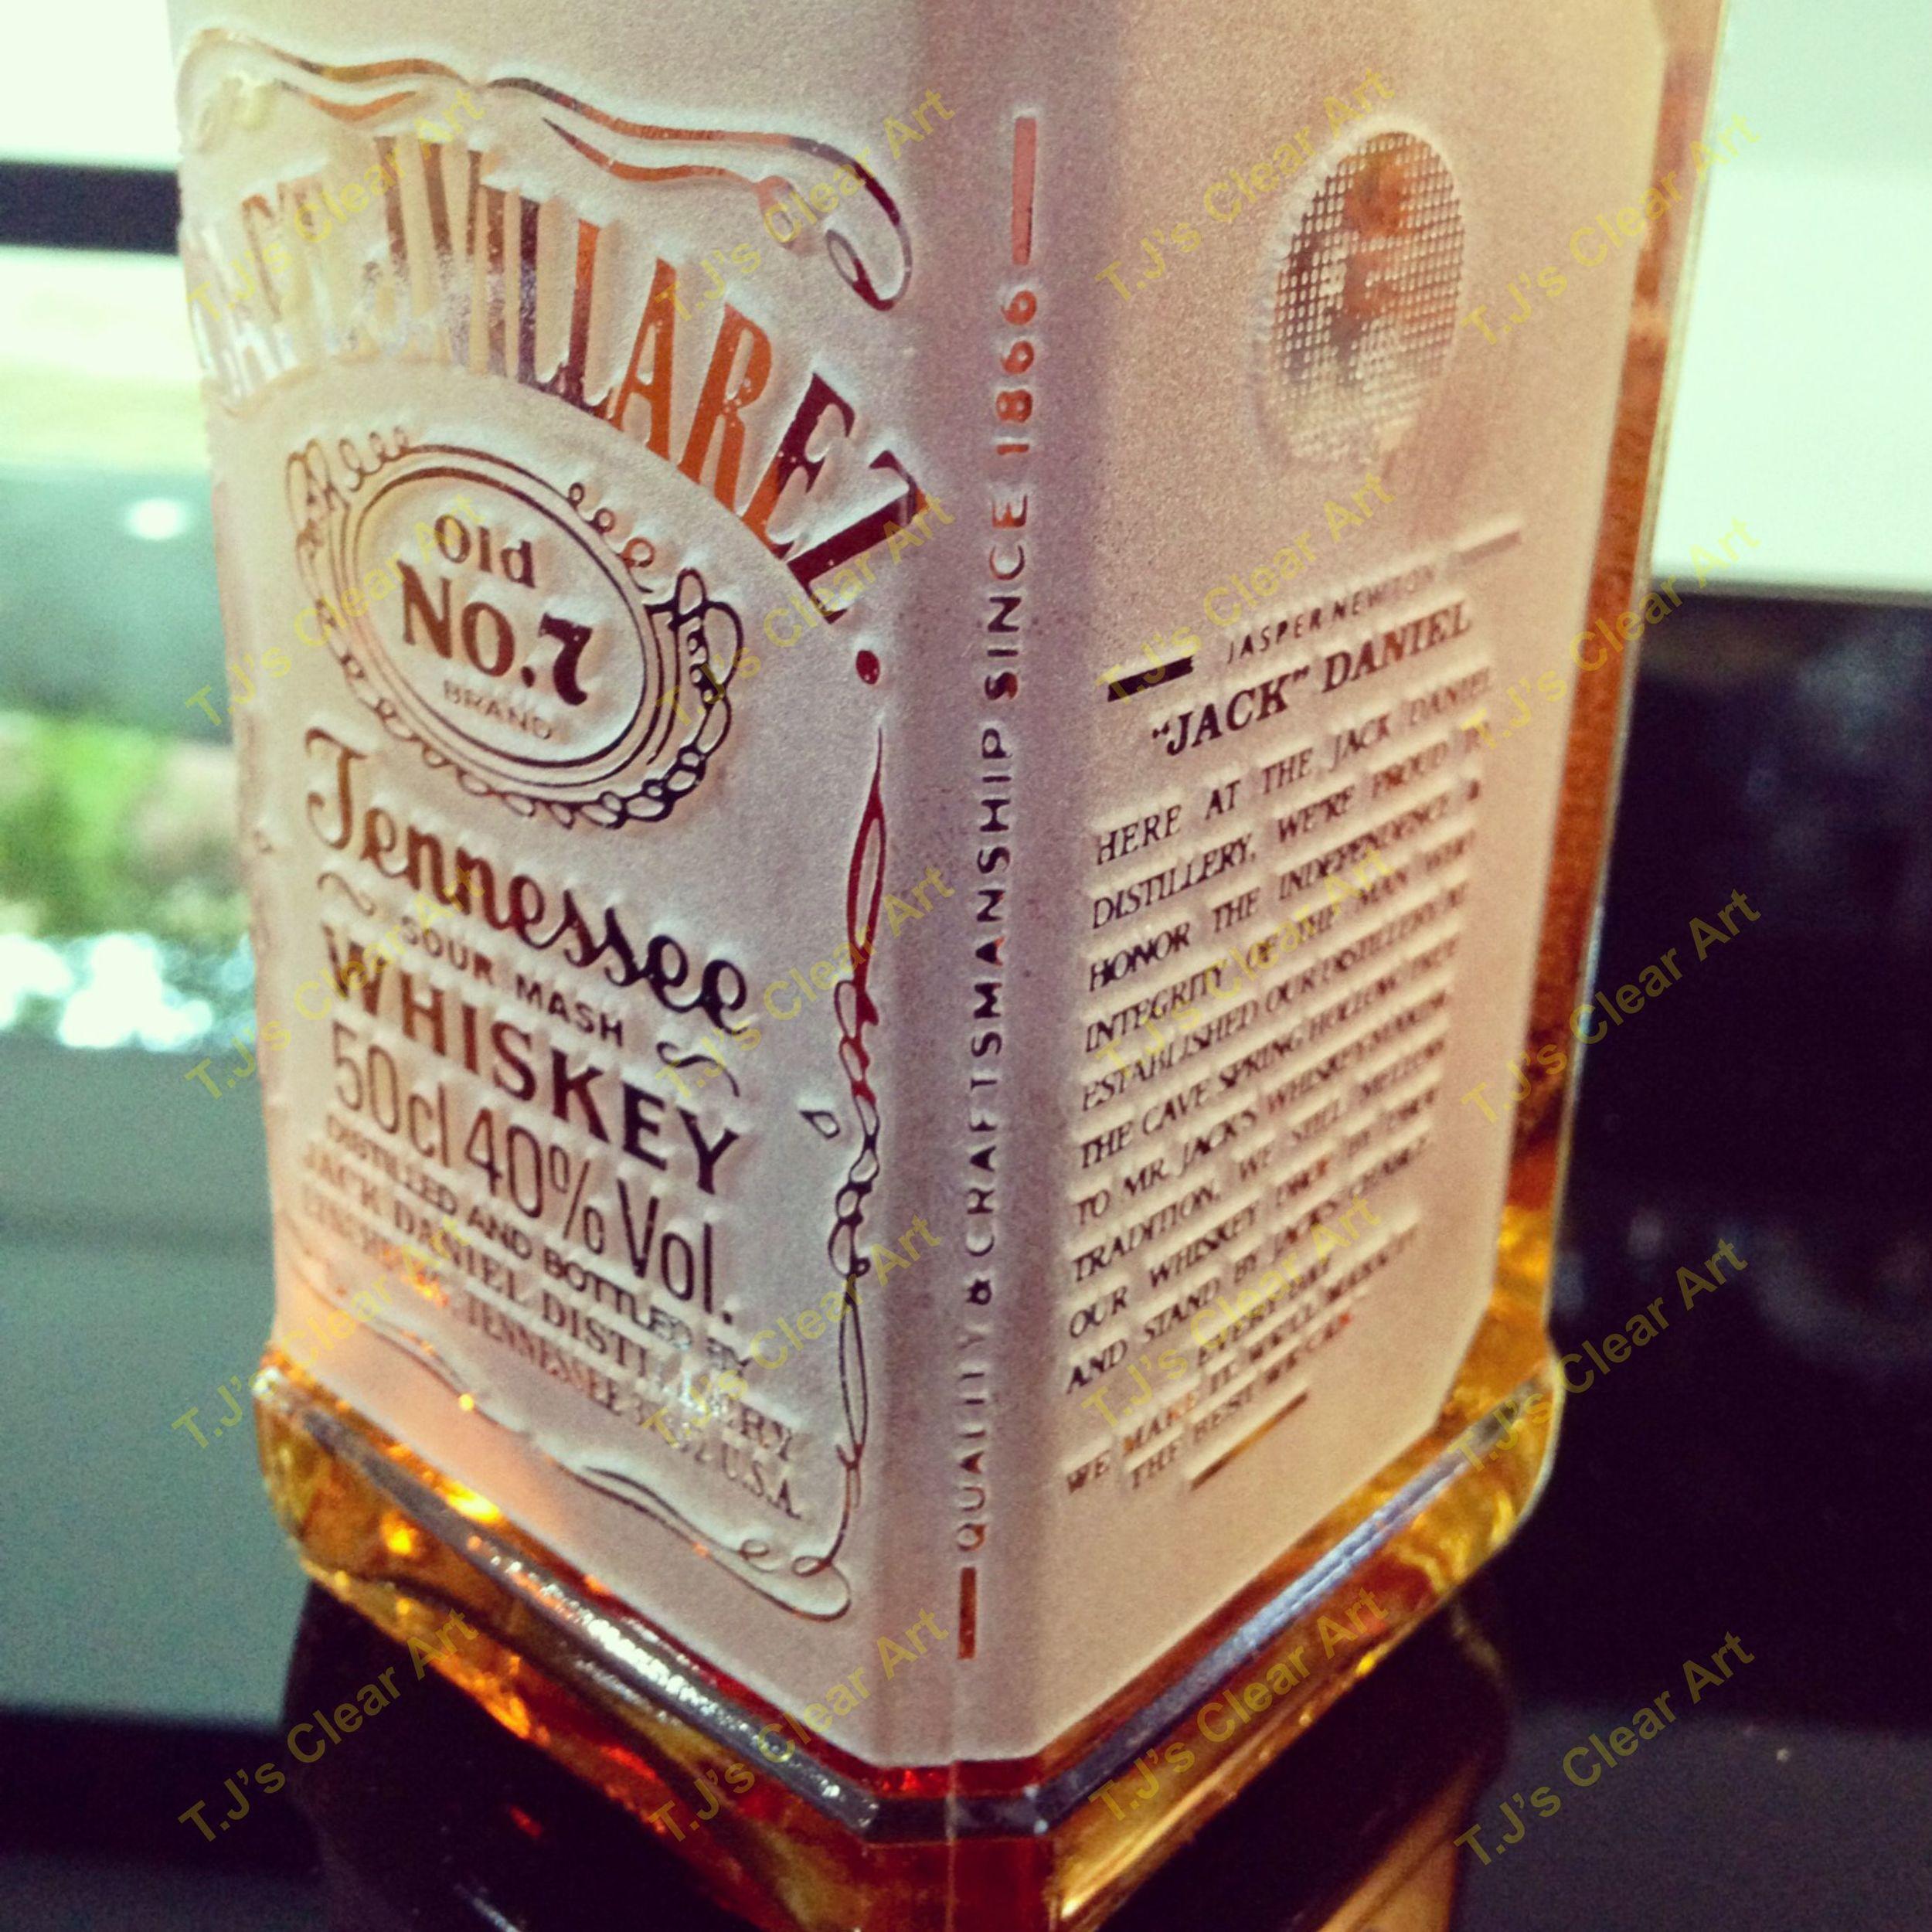 Personalized Liquor Bottle